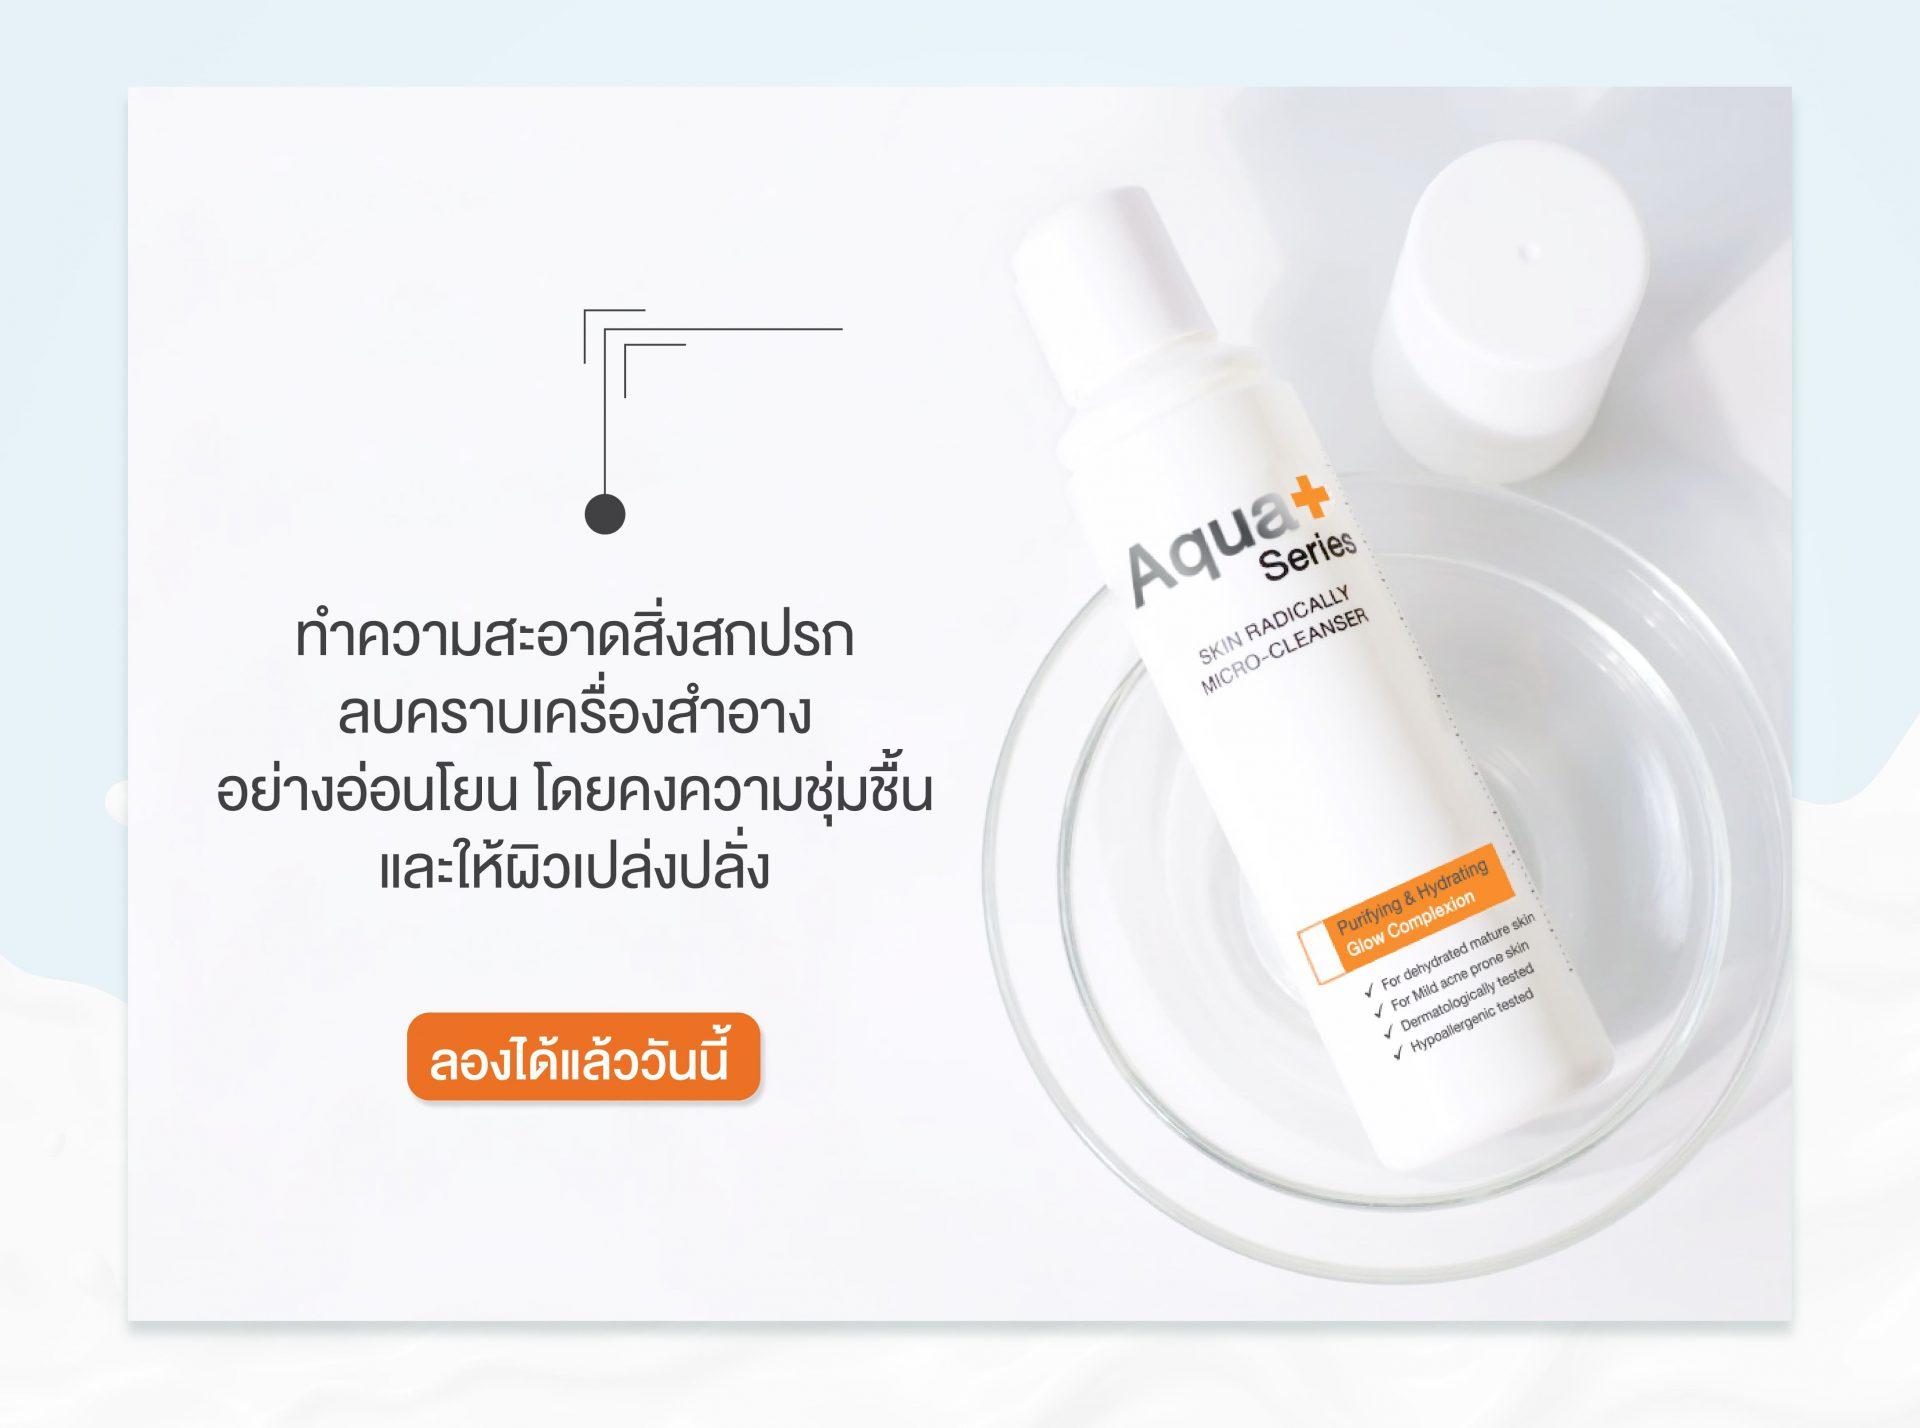 AquaPlus Skin Radically Micro-Cleanser คลีนซิ่ง คลีนเซอร์ ล้างเมคอัพ ทำความสะอาดผิวหน้า